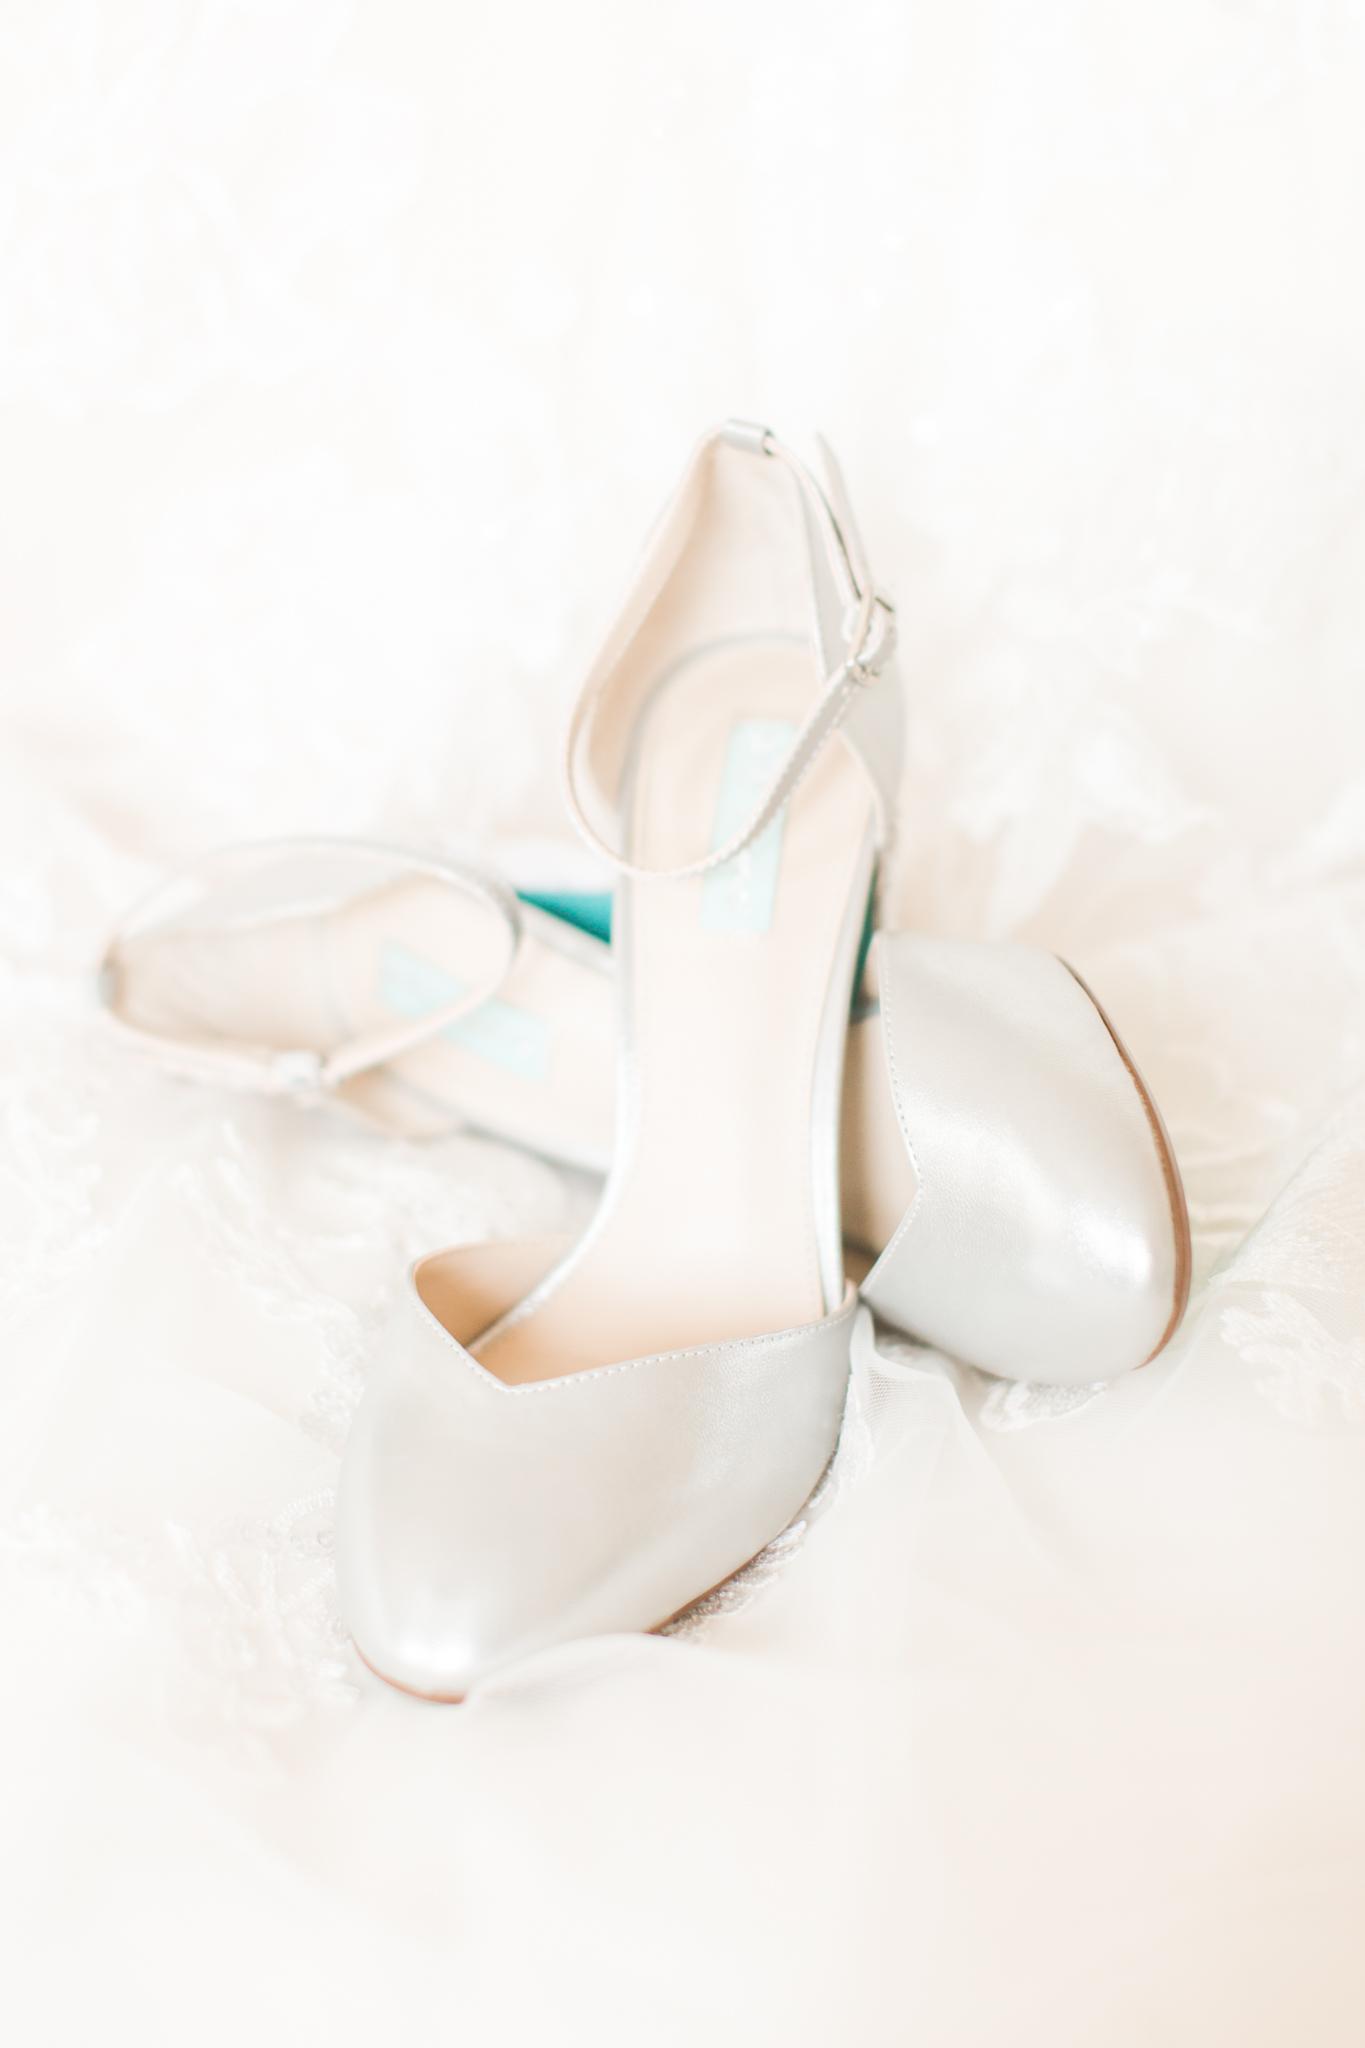 Haley Mansion Winter Wedding - Shaina Lee Photography-21.jpg